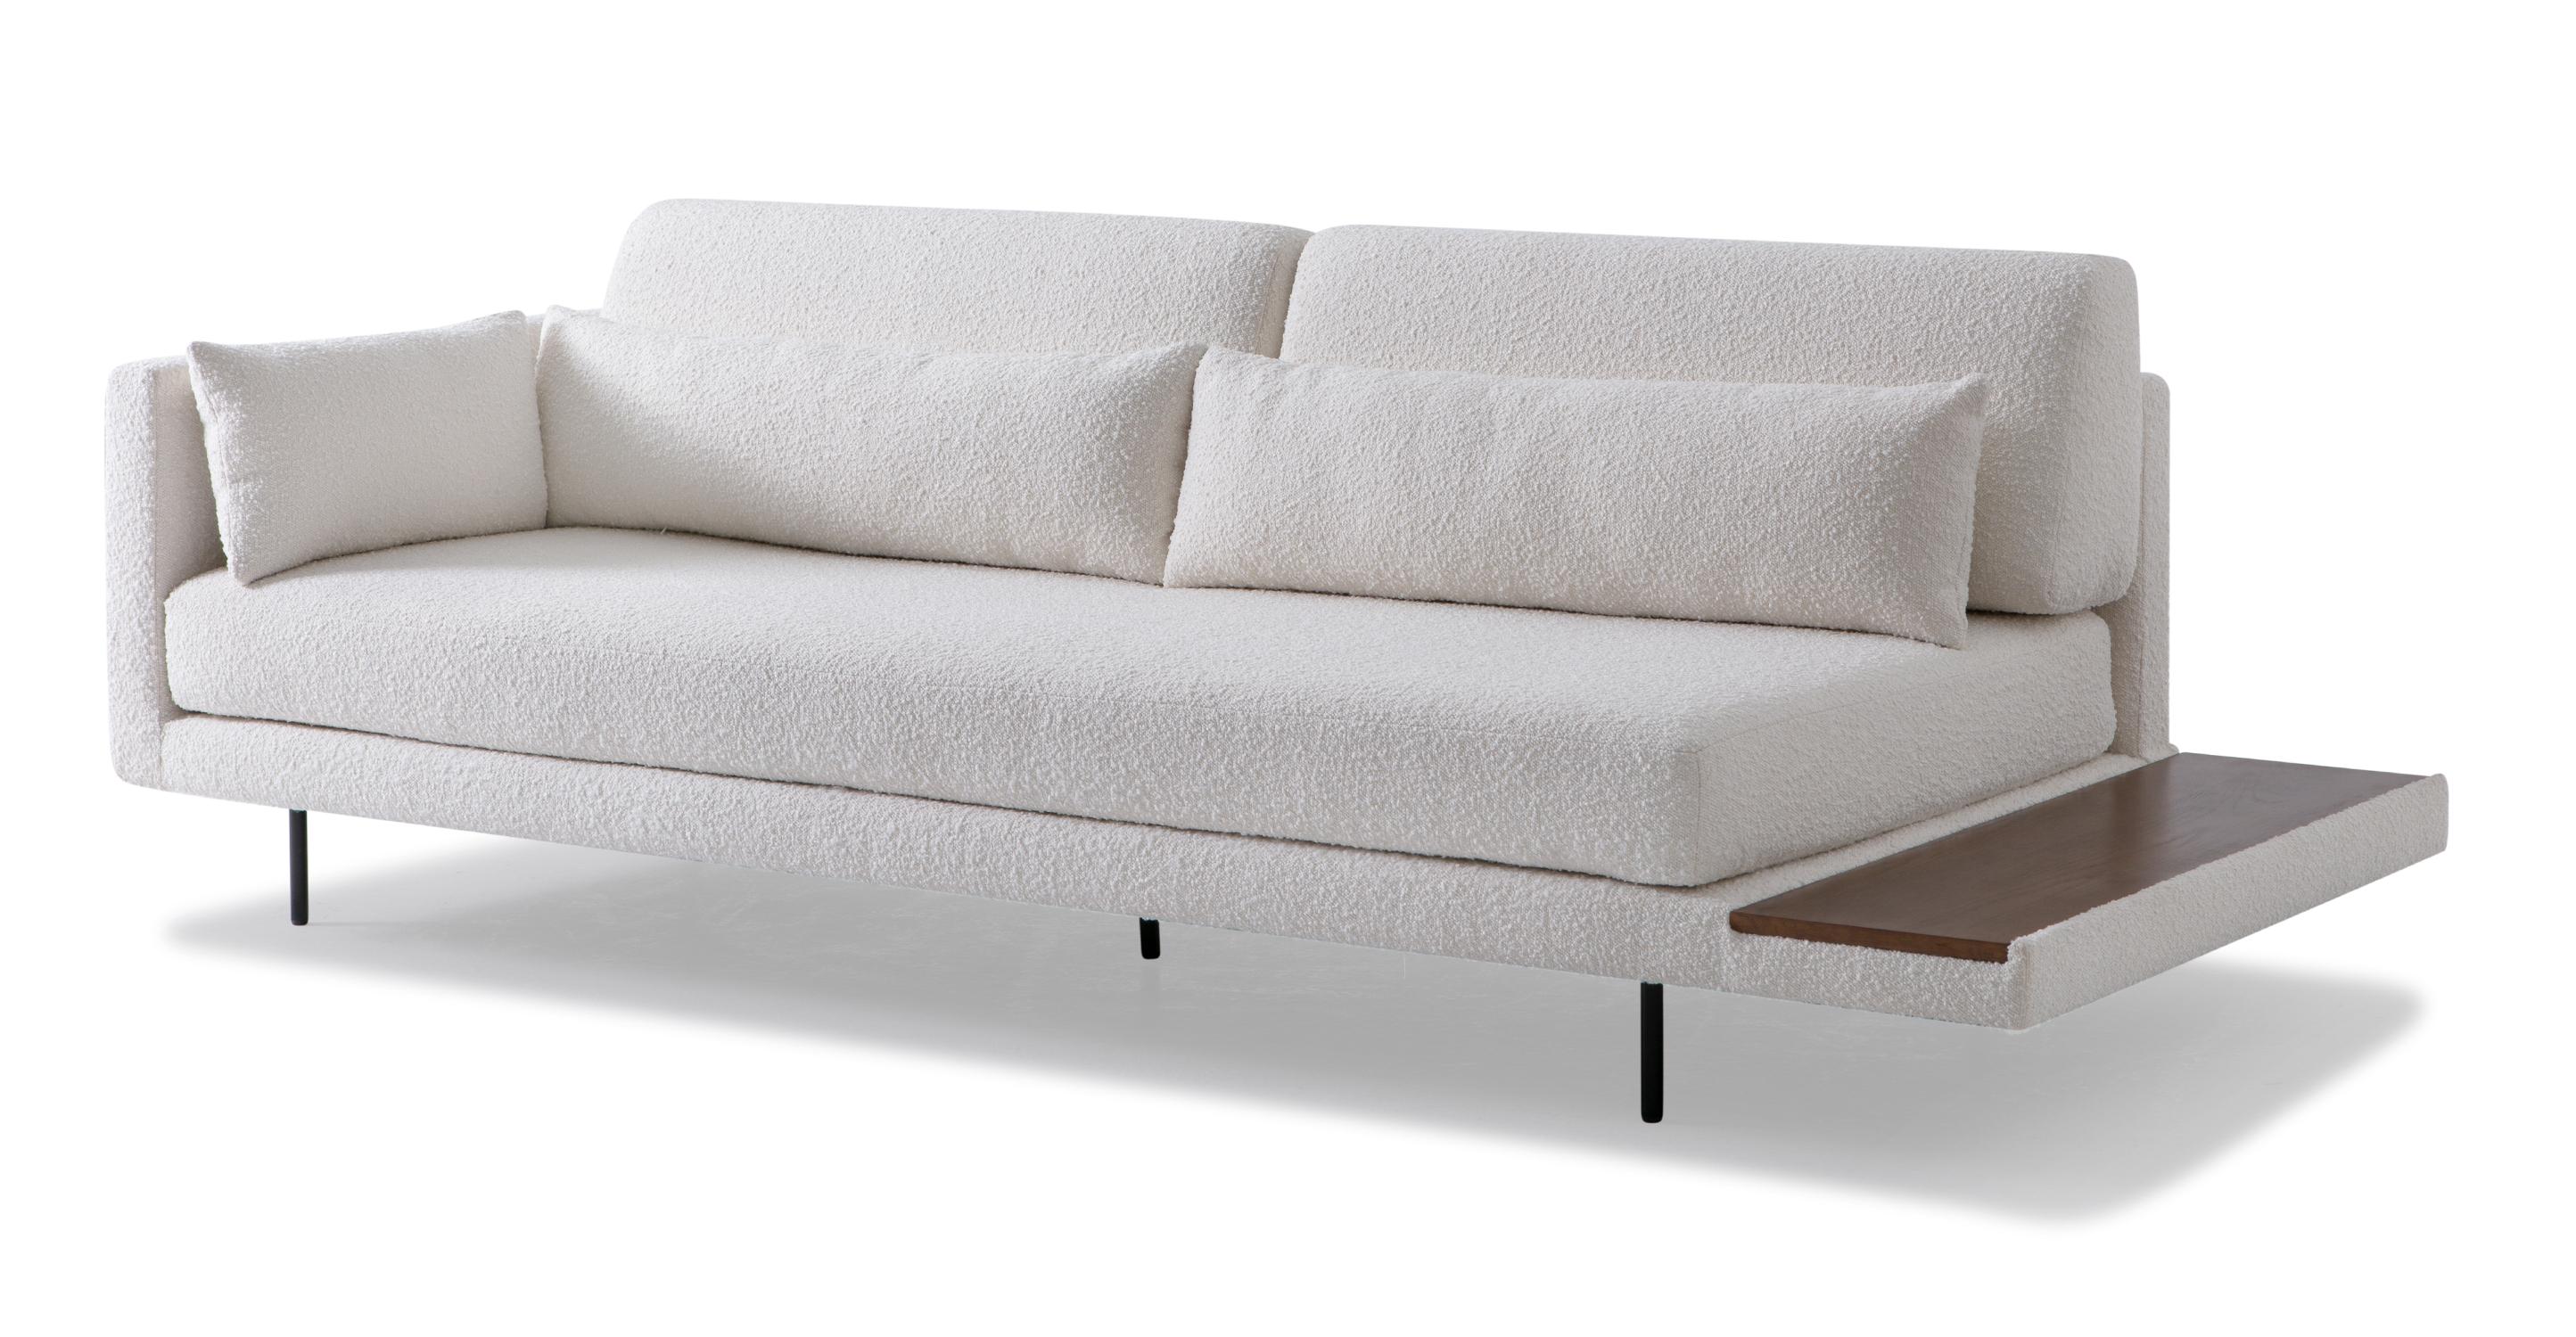 "Davenport 95"" Fabric Sofa Sleeper, Blanc Boucle"